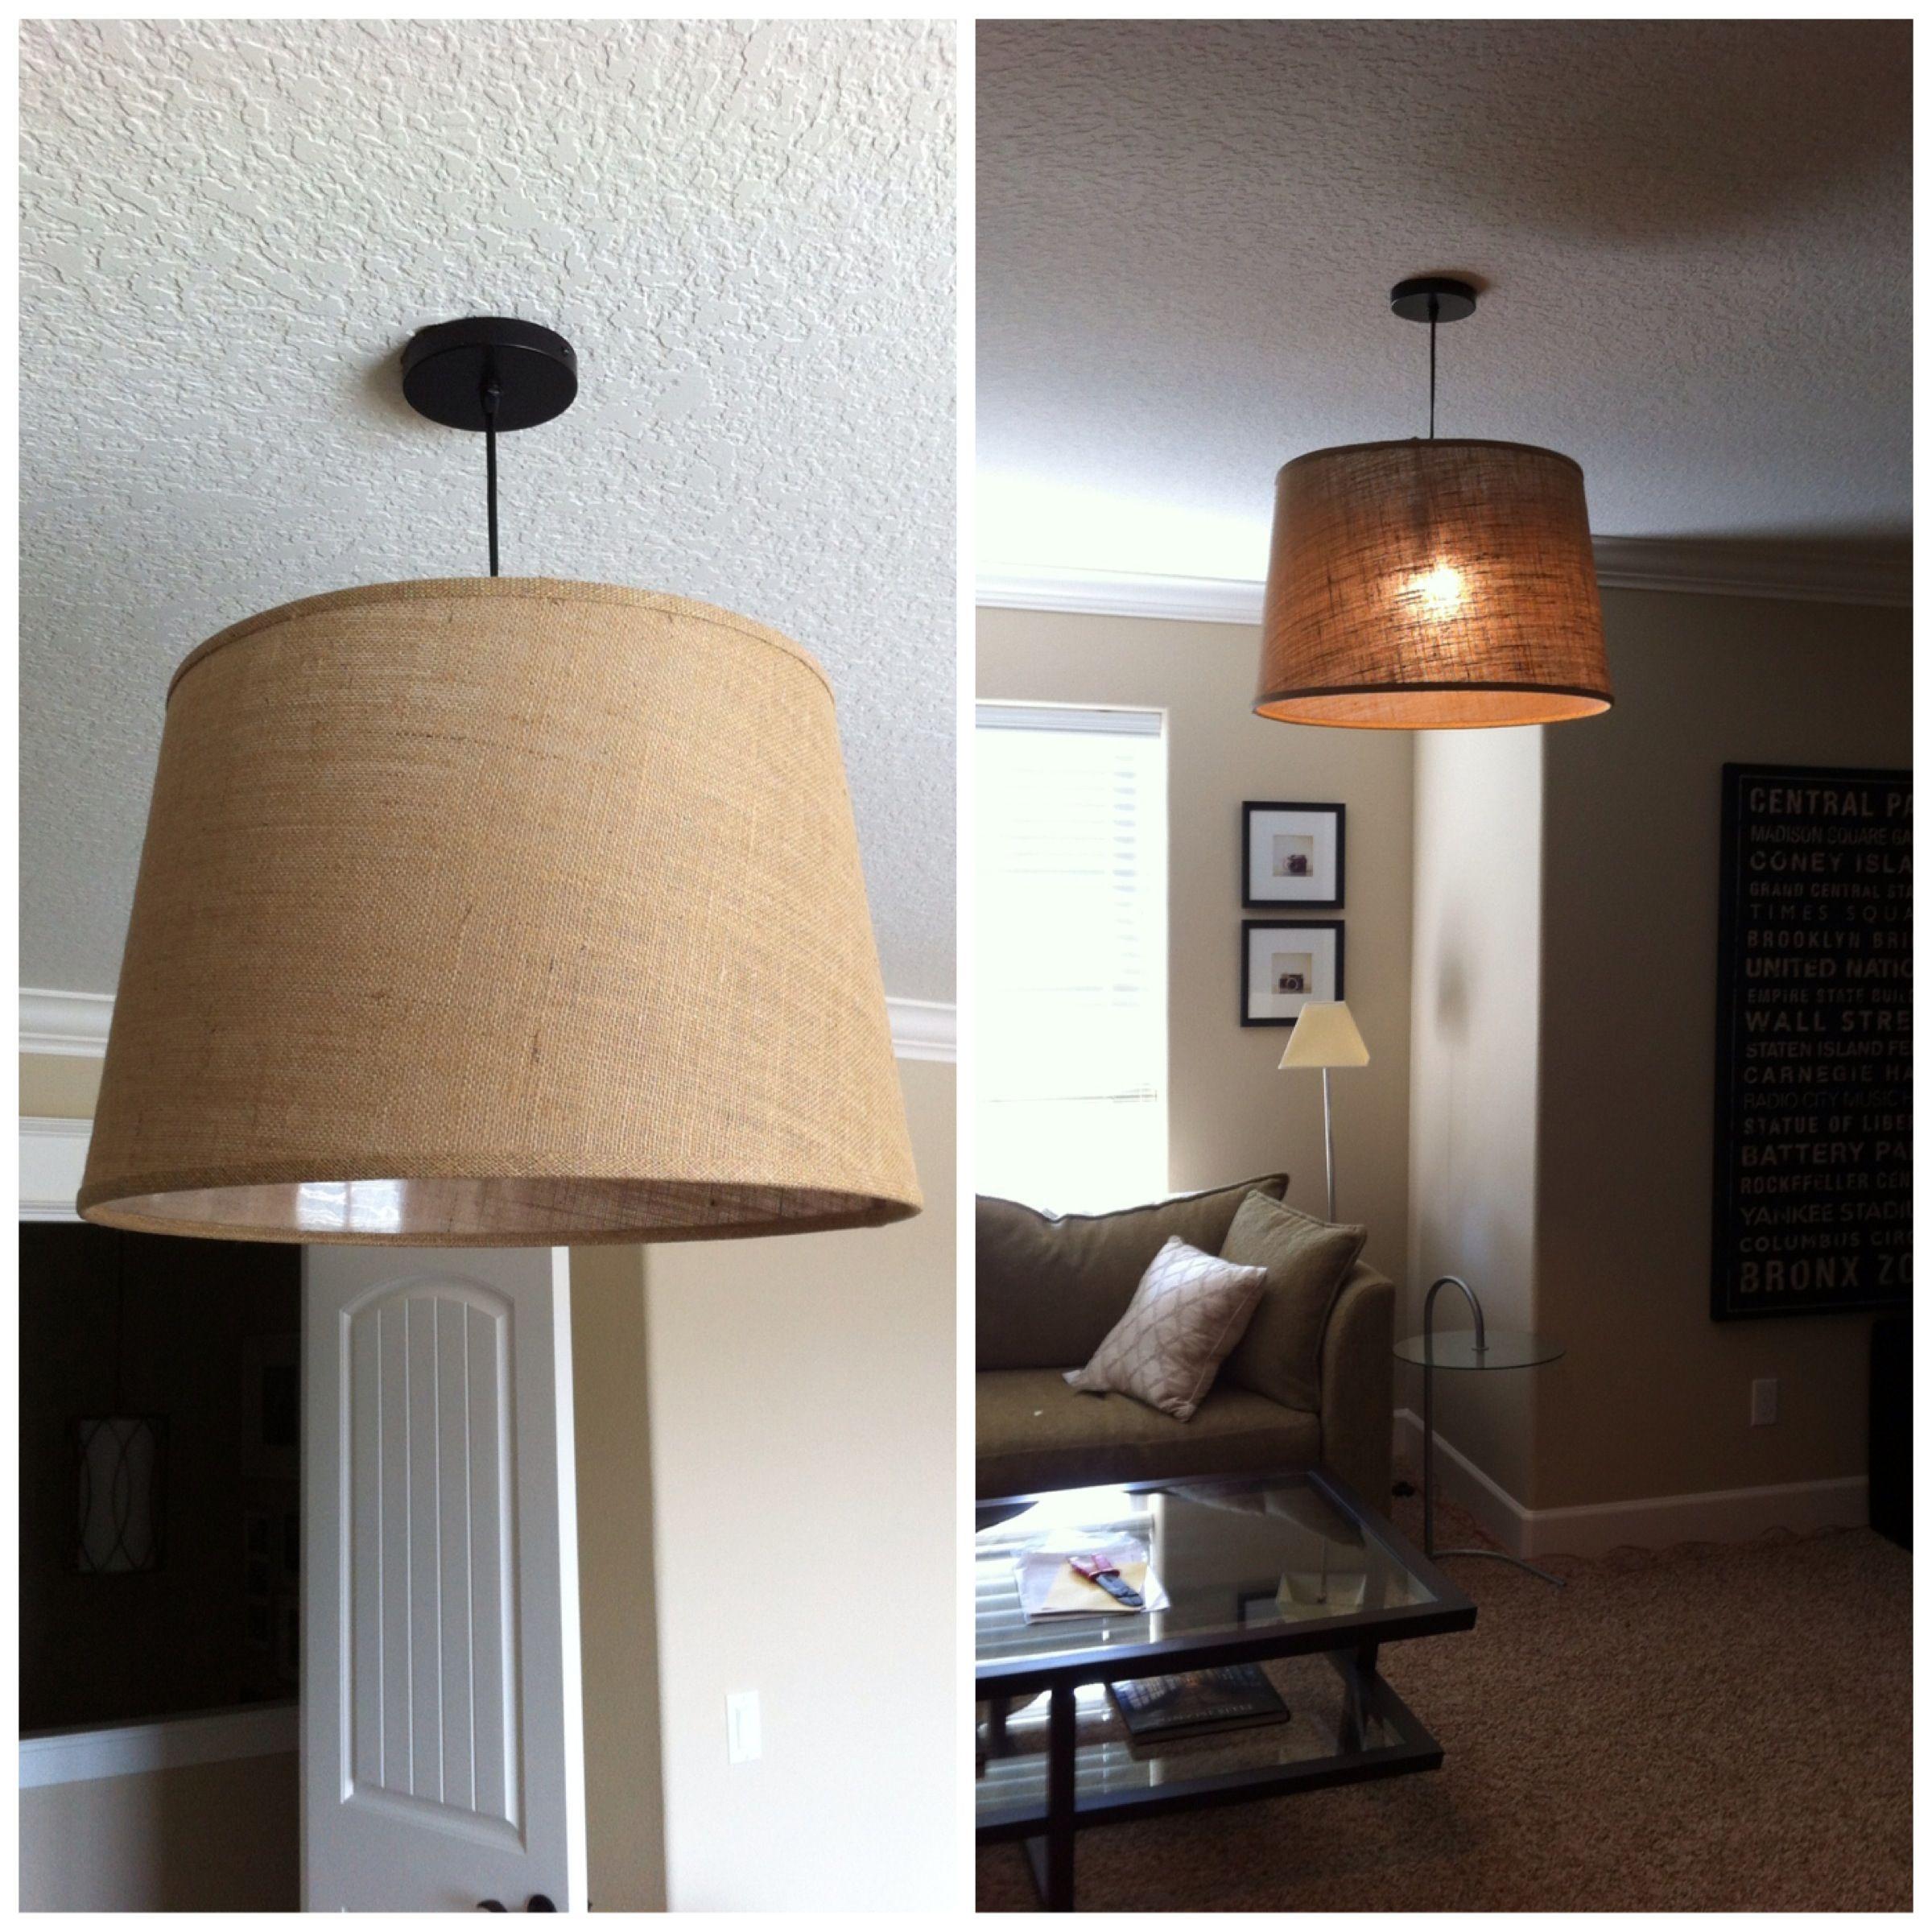 Cheapest Diy Pendant Cost Plus Black Electrical Ceiling Hardware Kit 12 99 Natural Burlap Floor Lamp Shad Diy Floor Lamp Lamps Living Room Diy Pendant Light